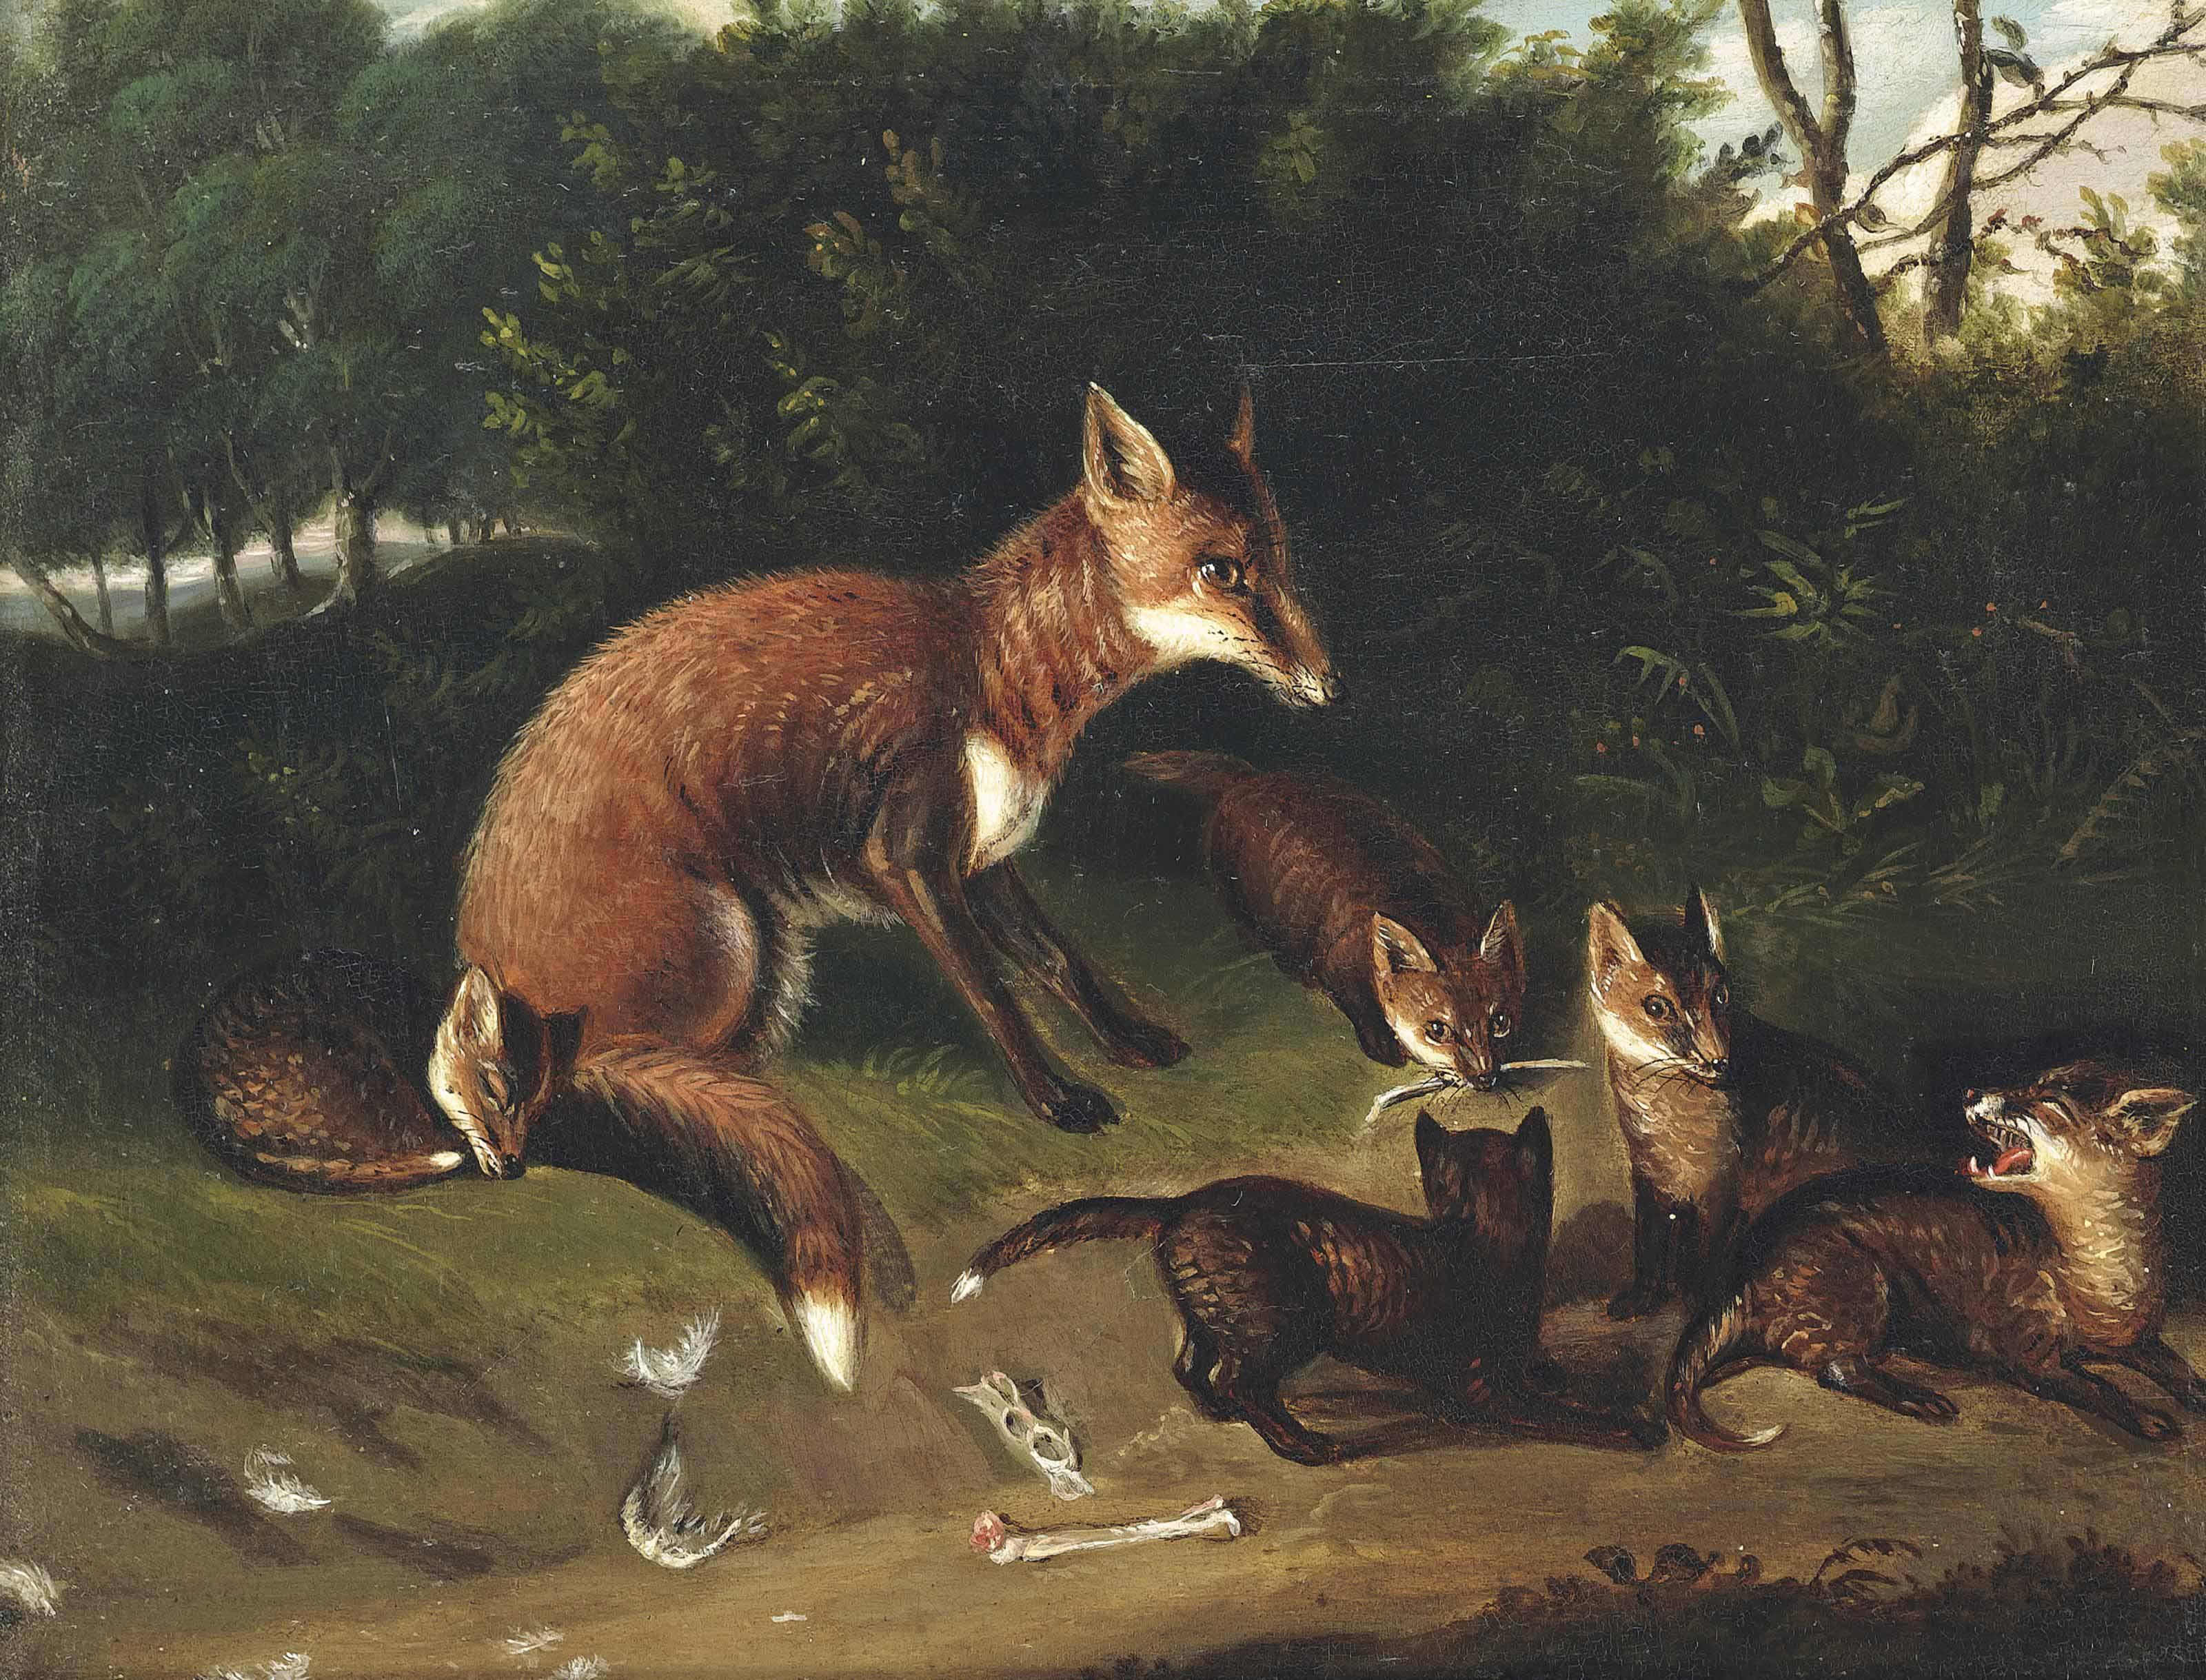 A vixen and her cubs